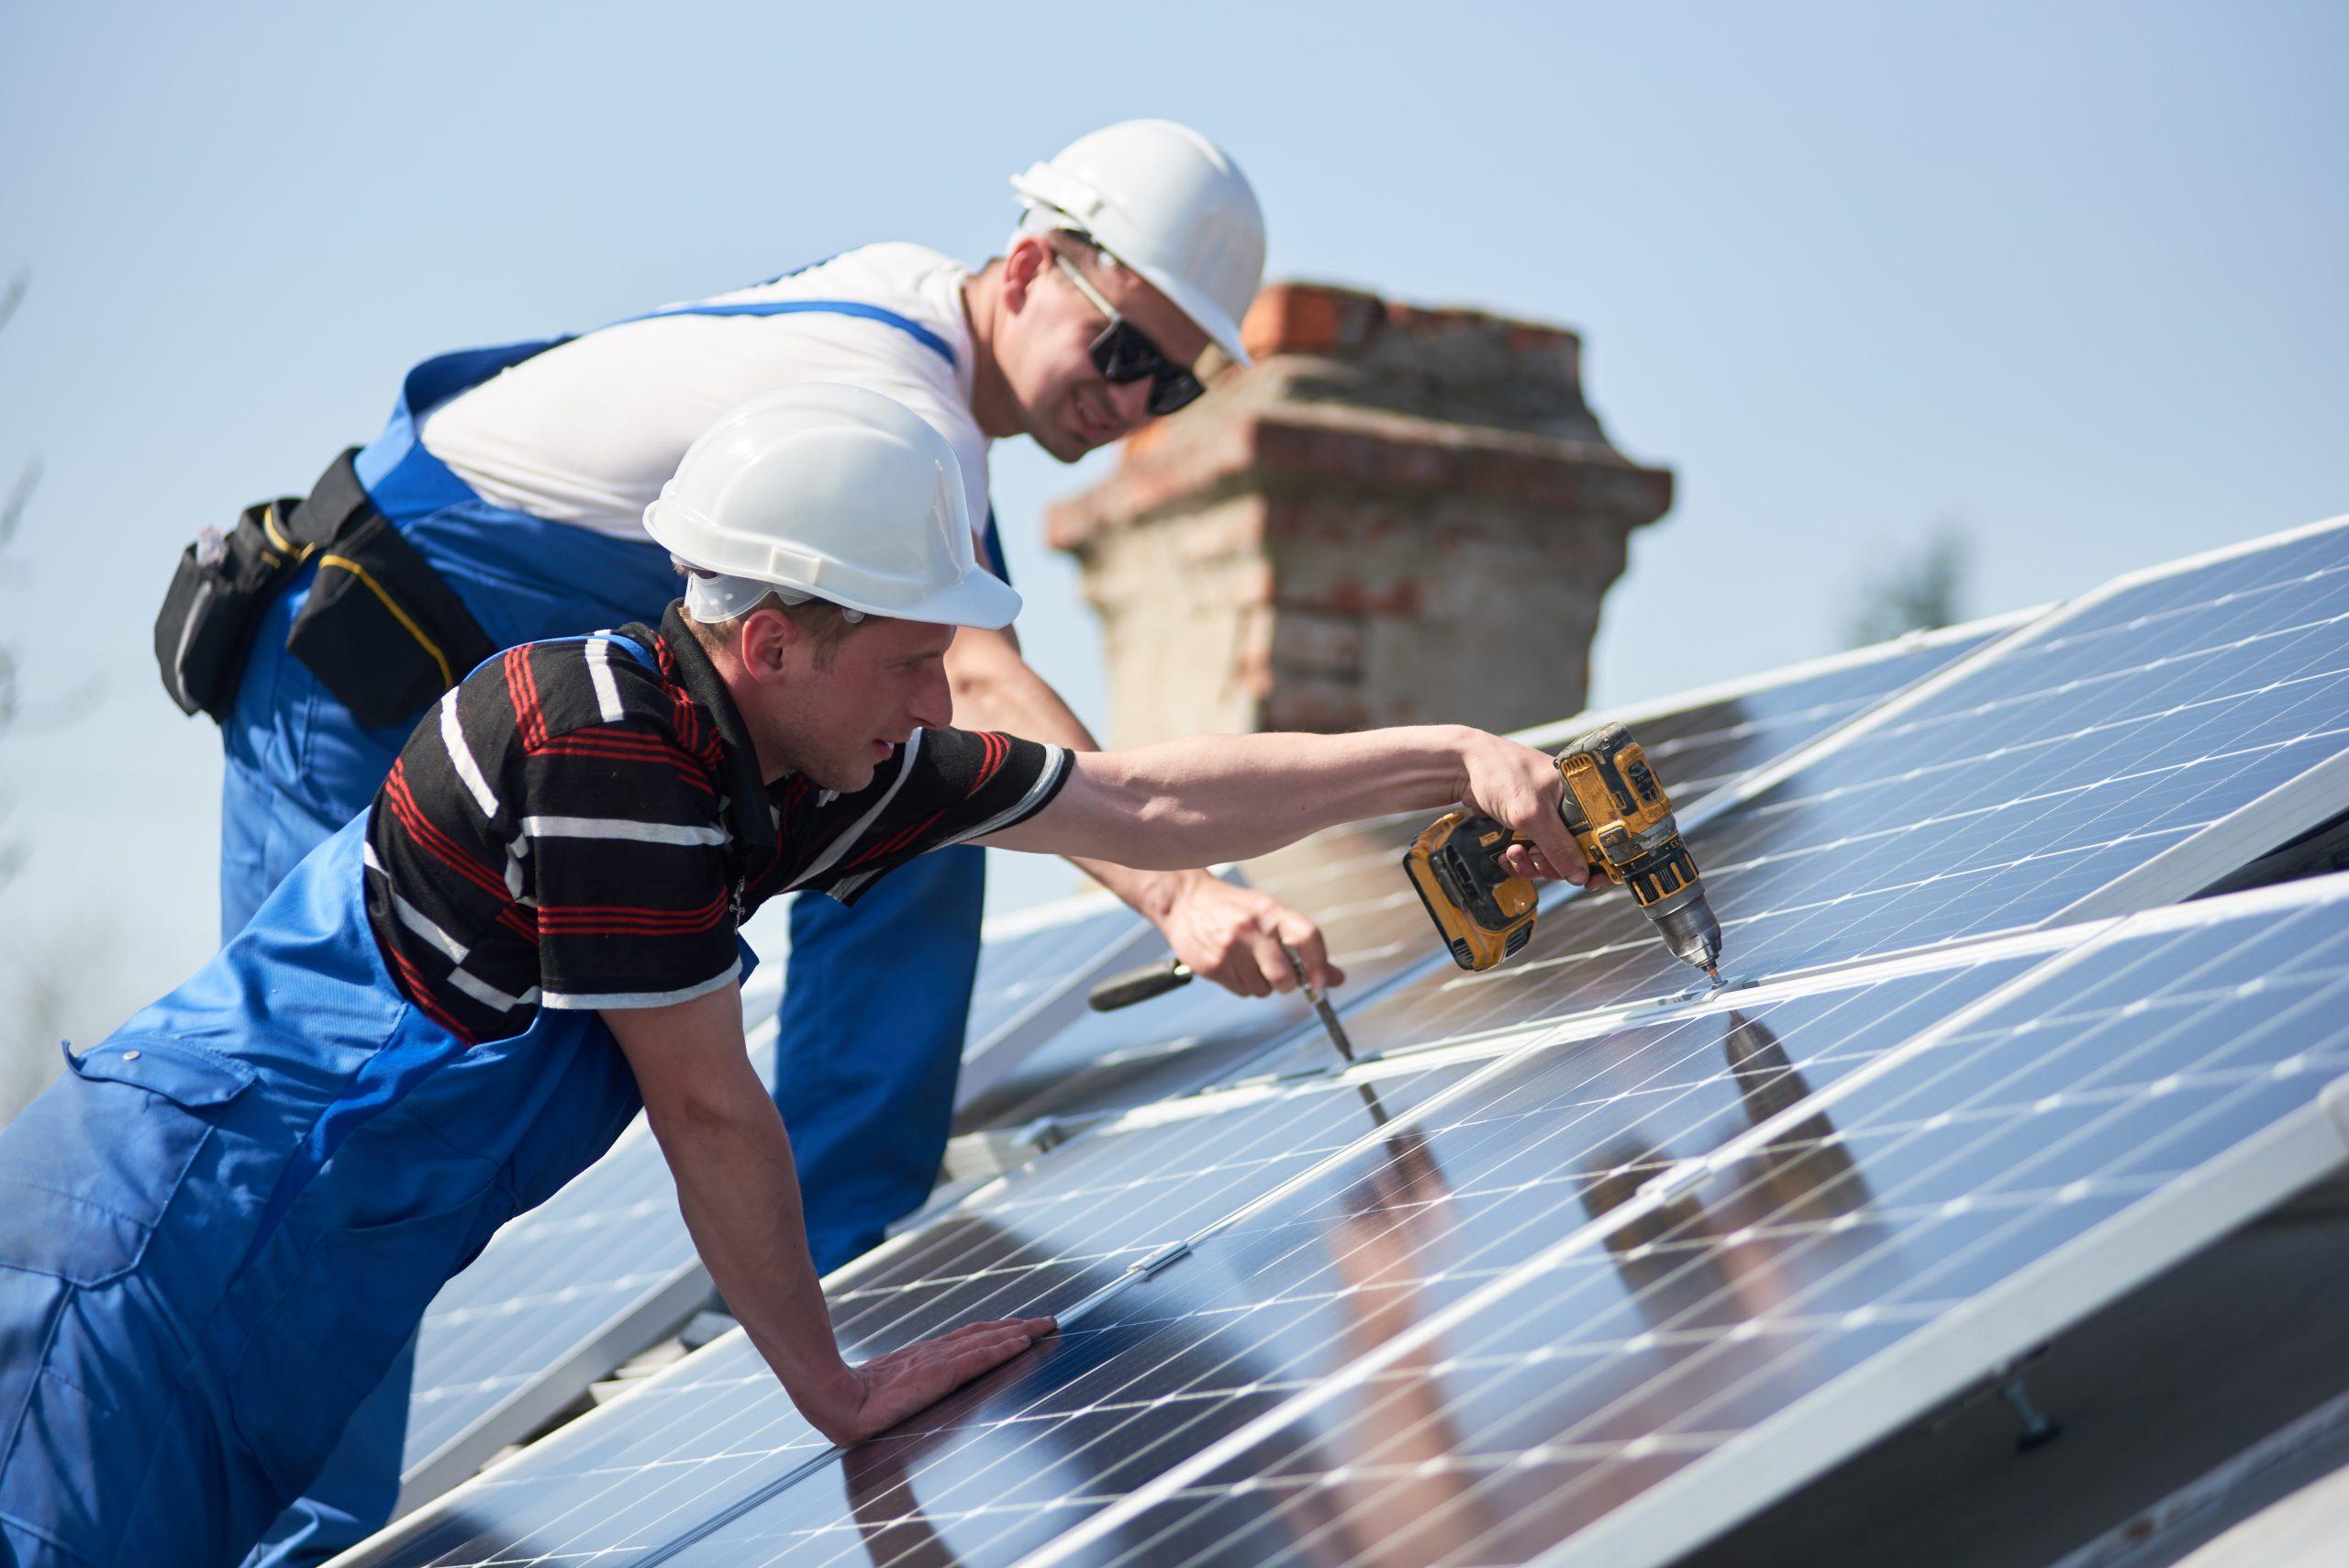 Photovoltaics installations